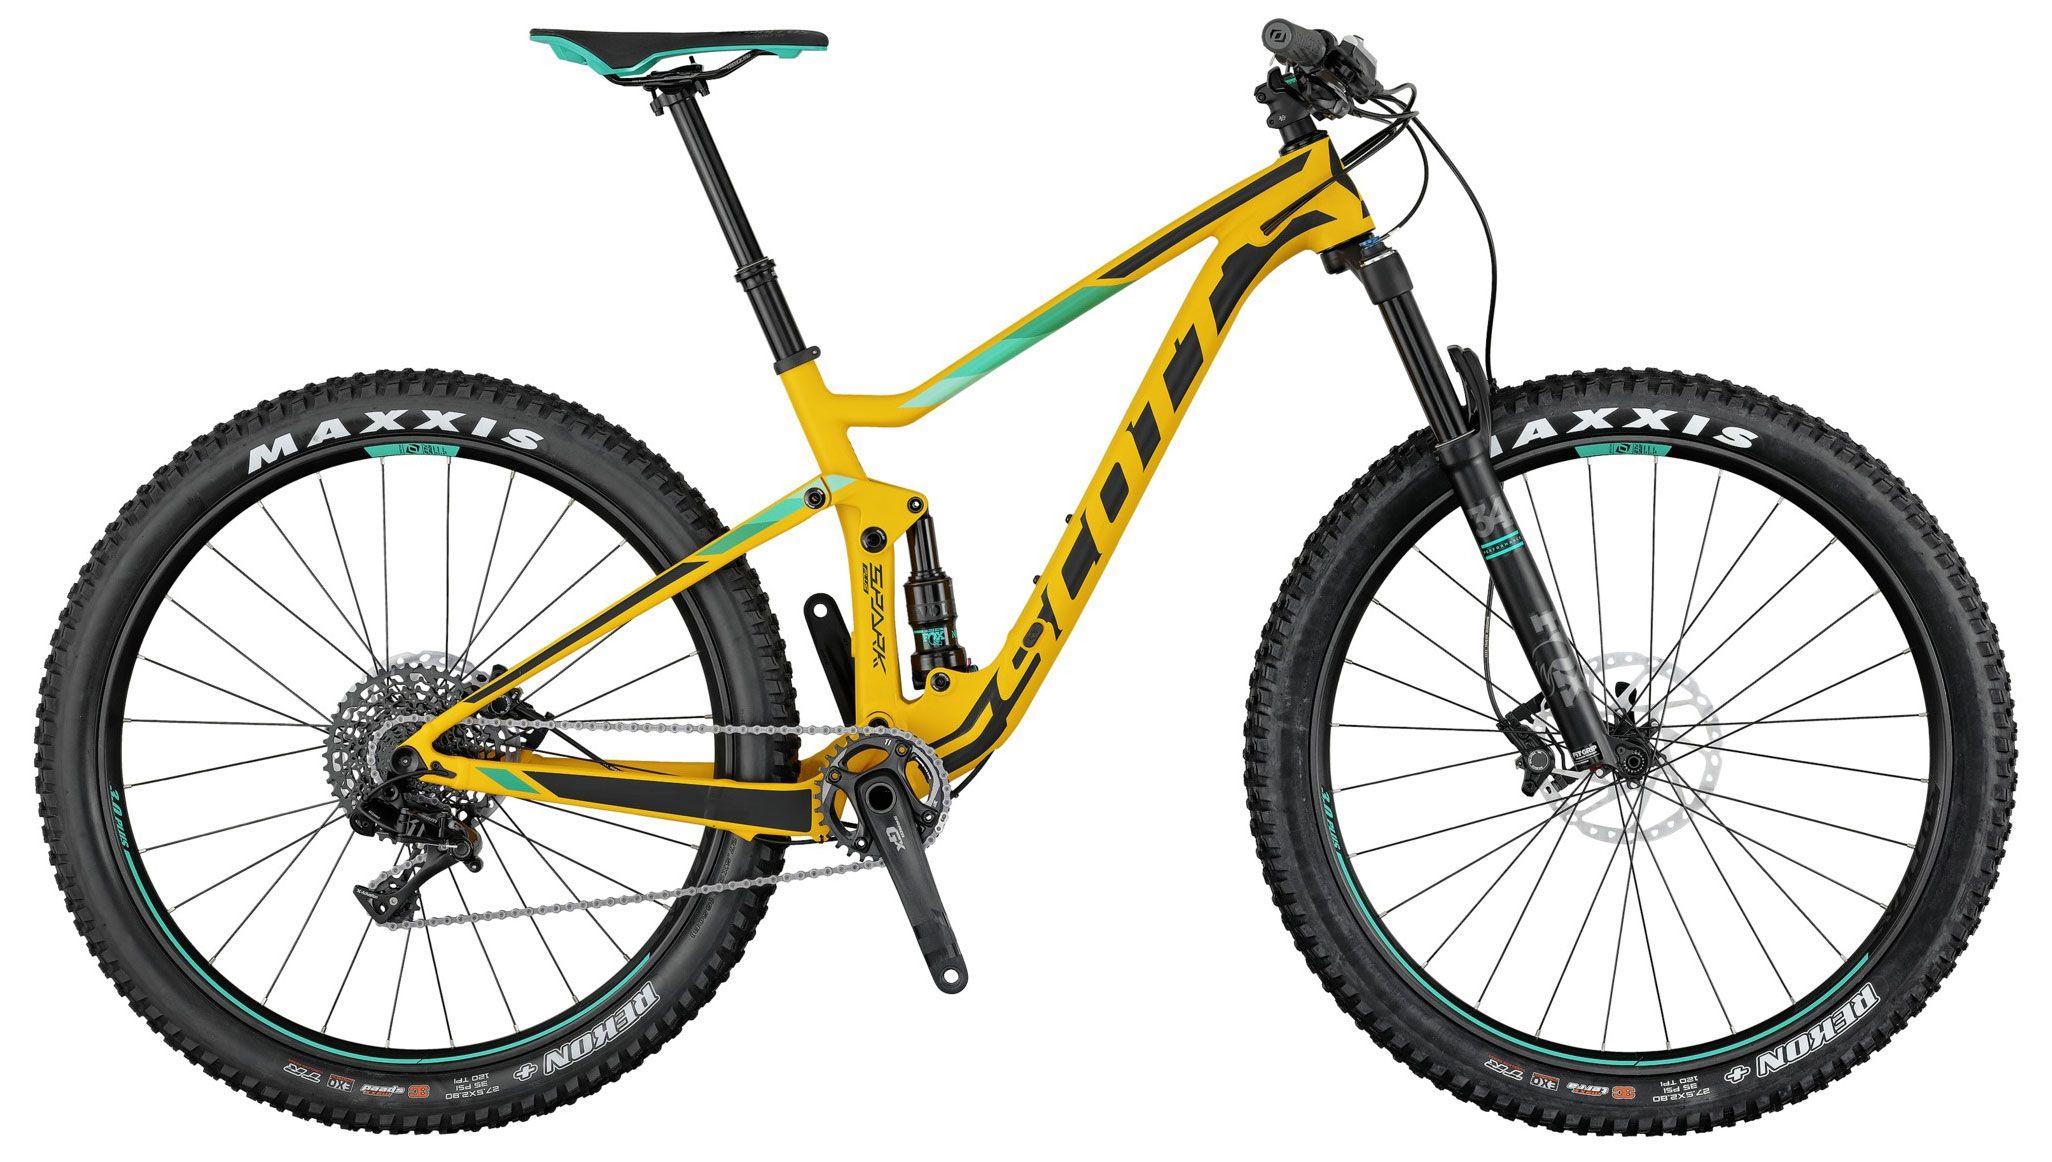 Велосипед Scott Spark 720 Plus 2017,  Двухподвесы  - артикул:276060